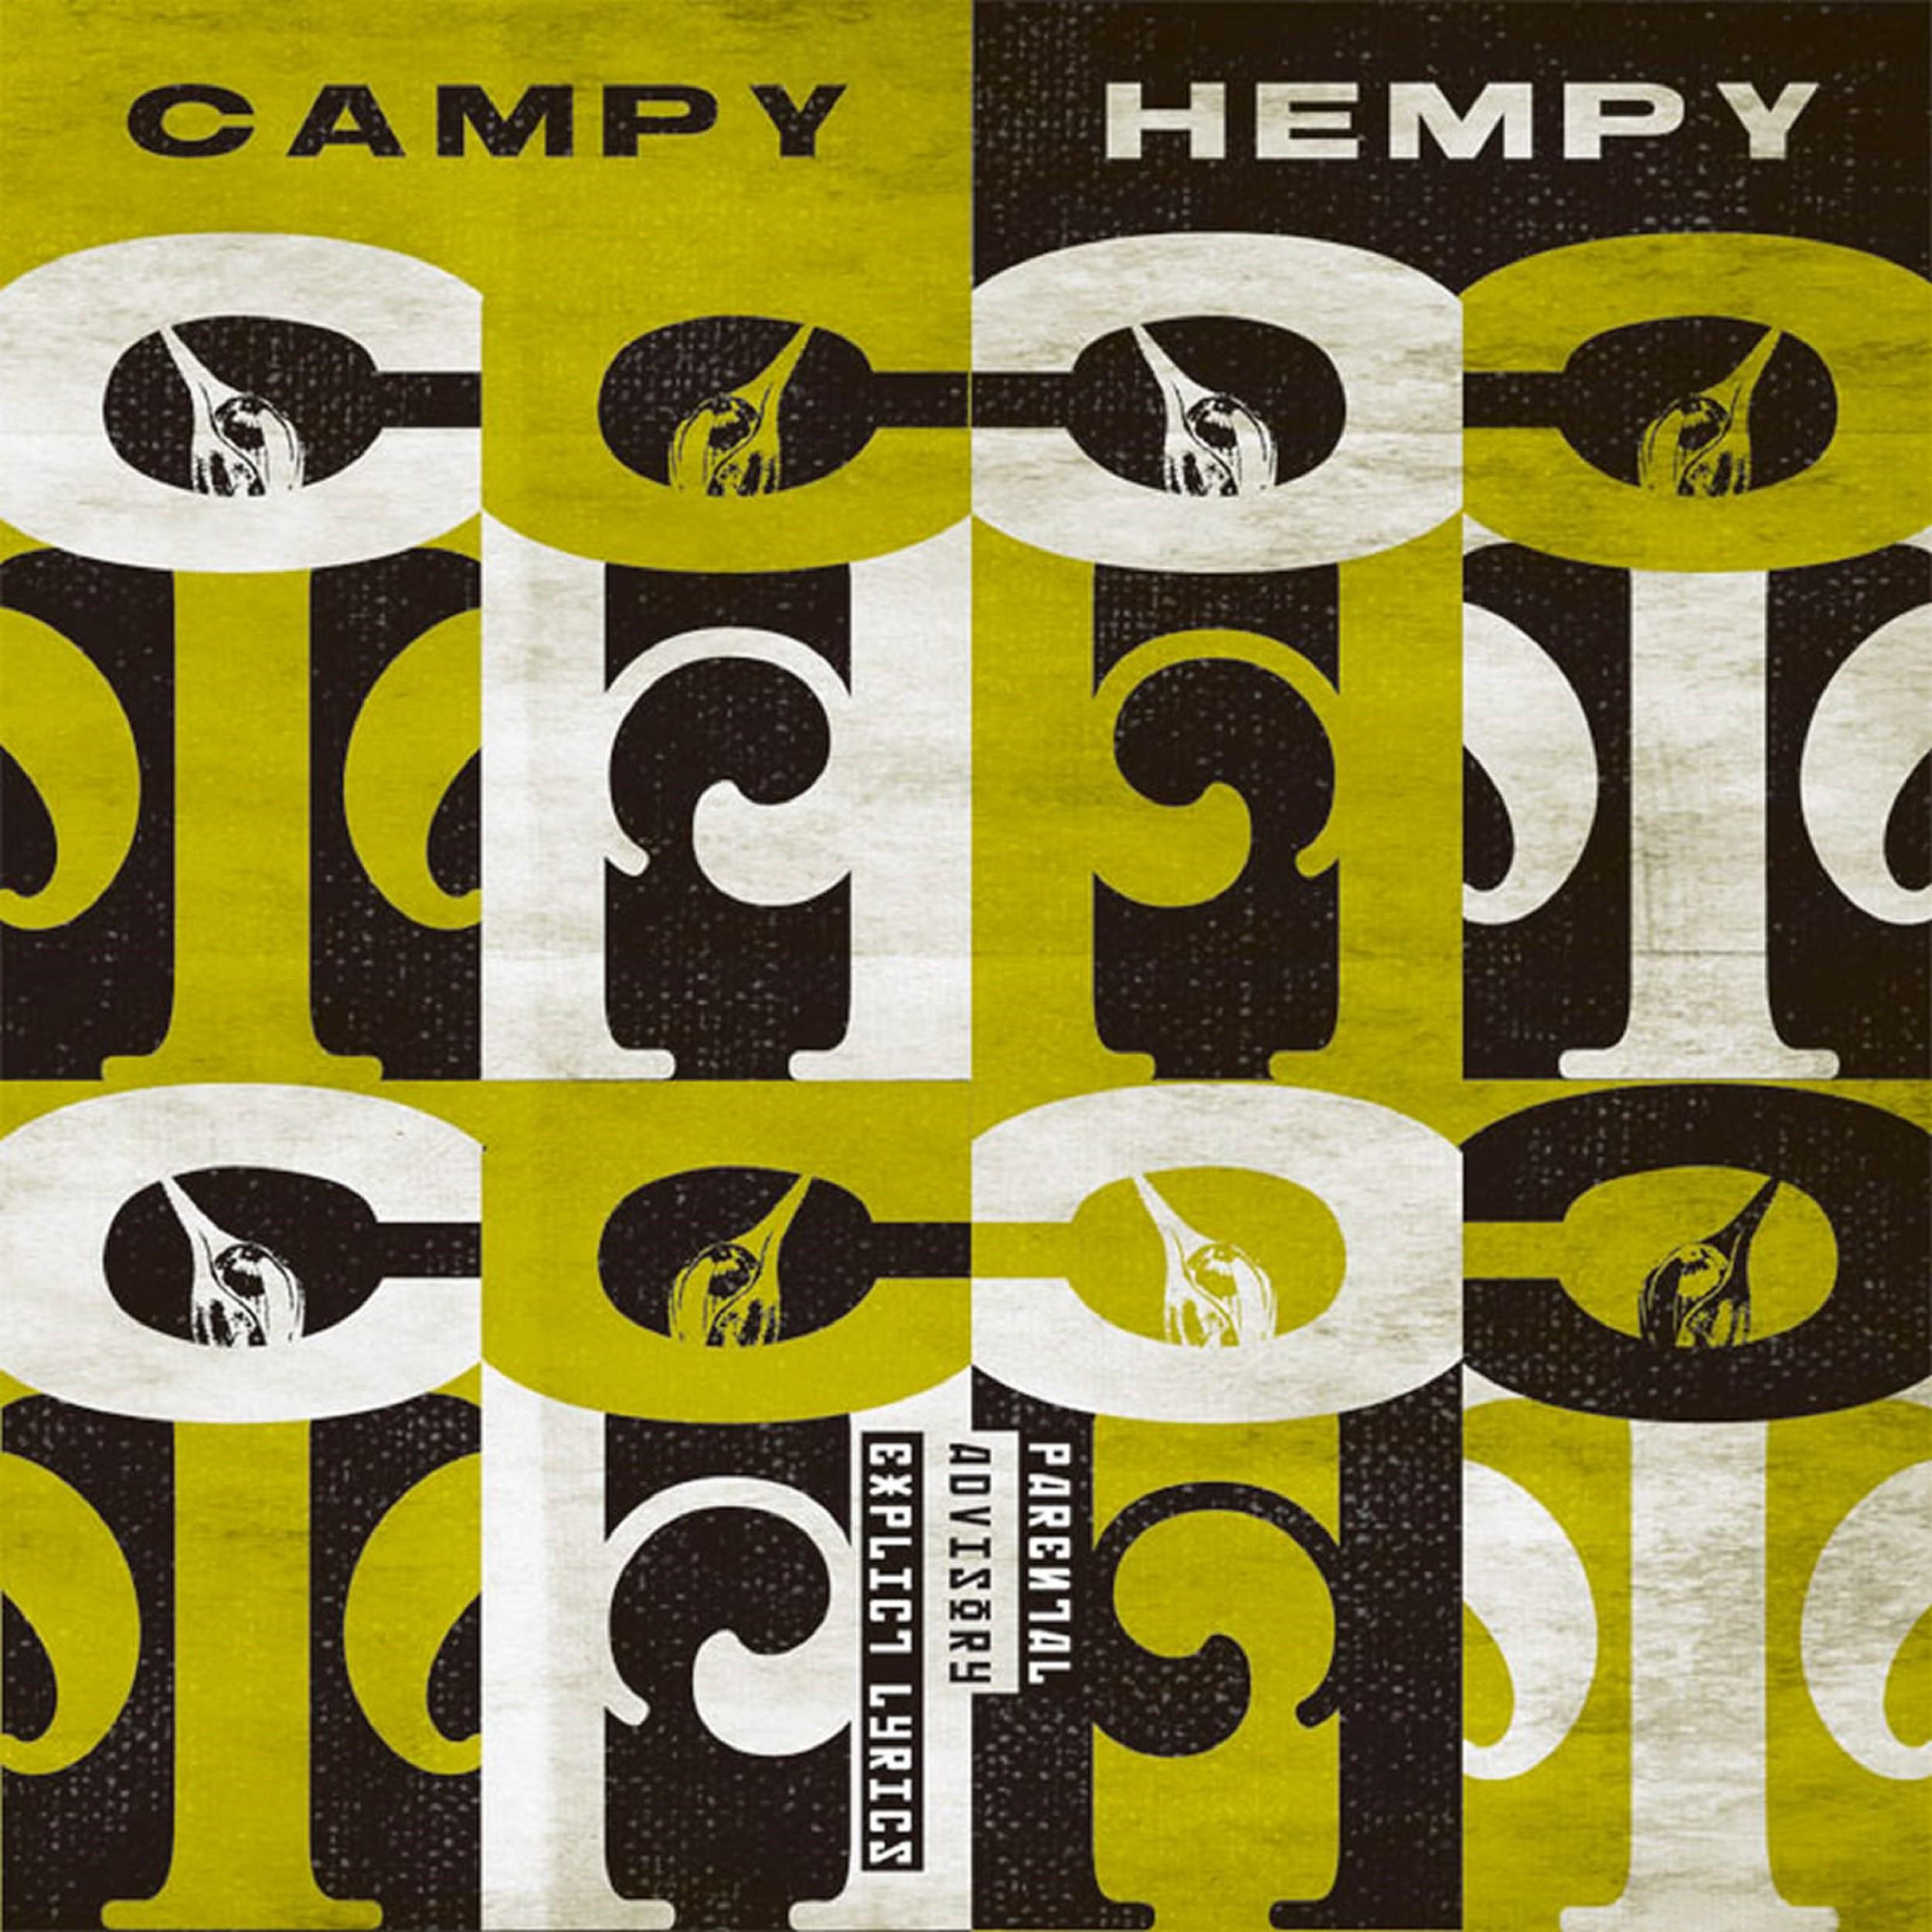 Image of campy & hempy / CAMPANELLA & TOSHI MAMUSHI